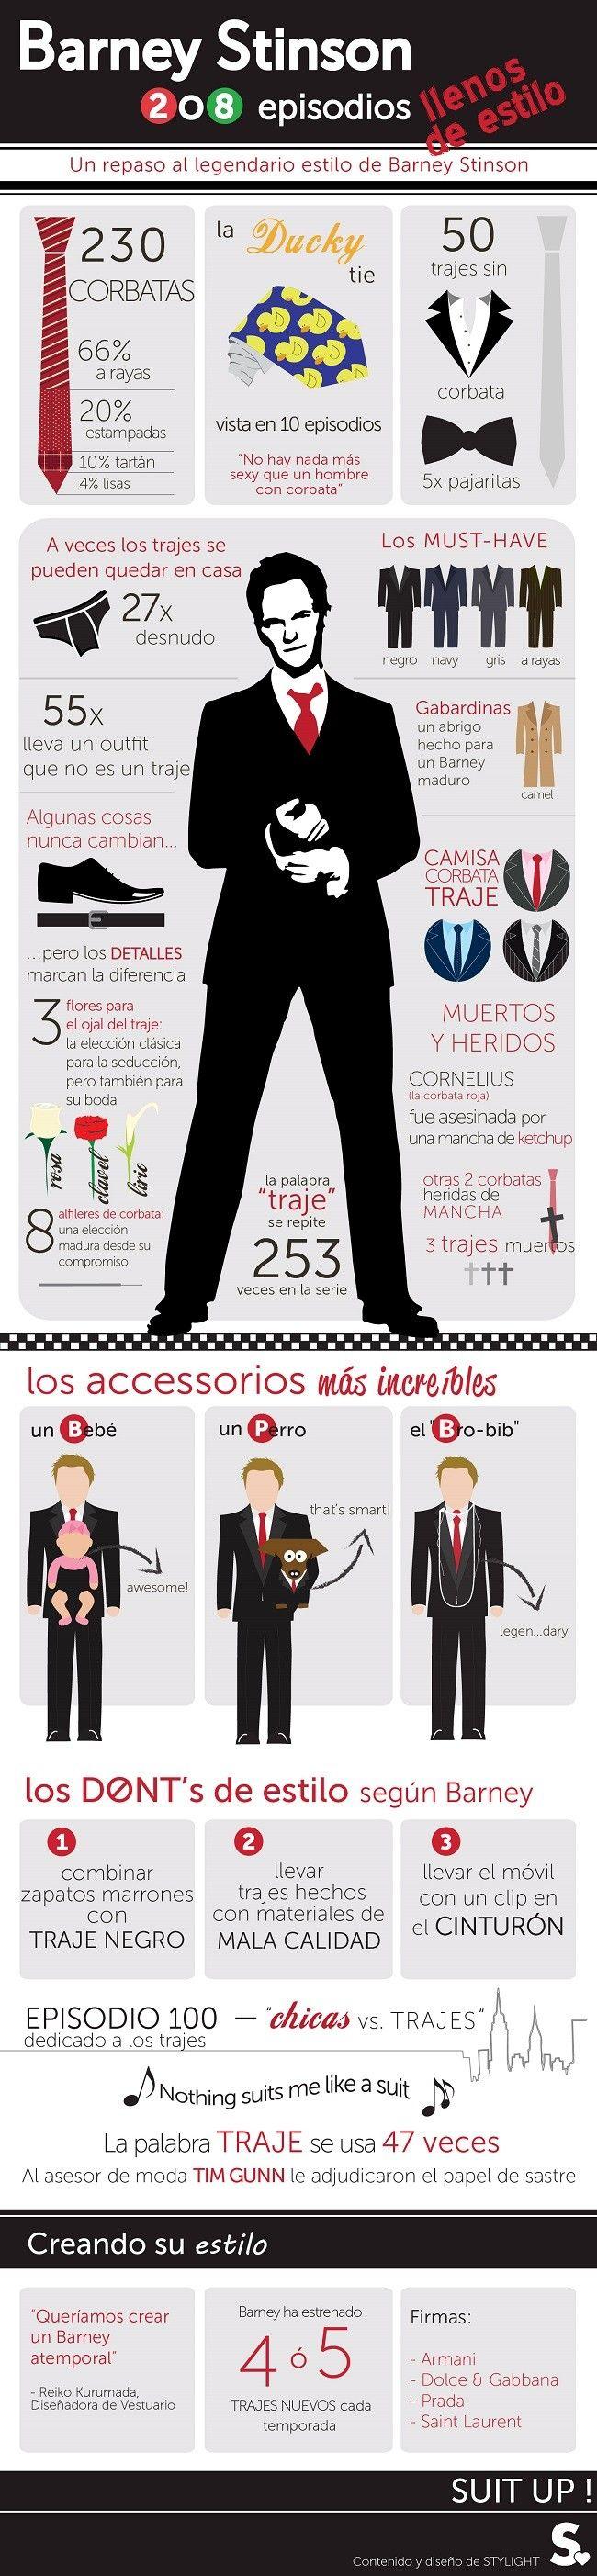 Muy grande esta #infografia de el #awesome Barney Stinson